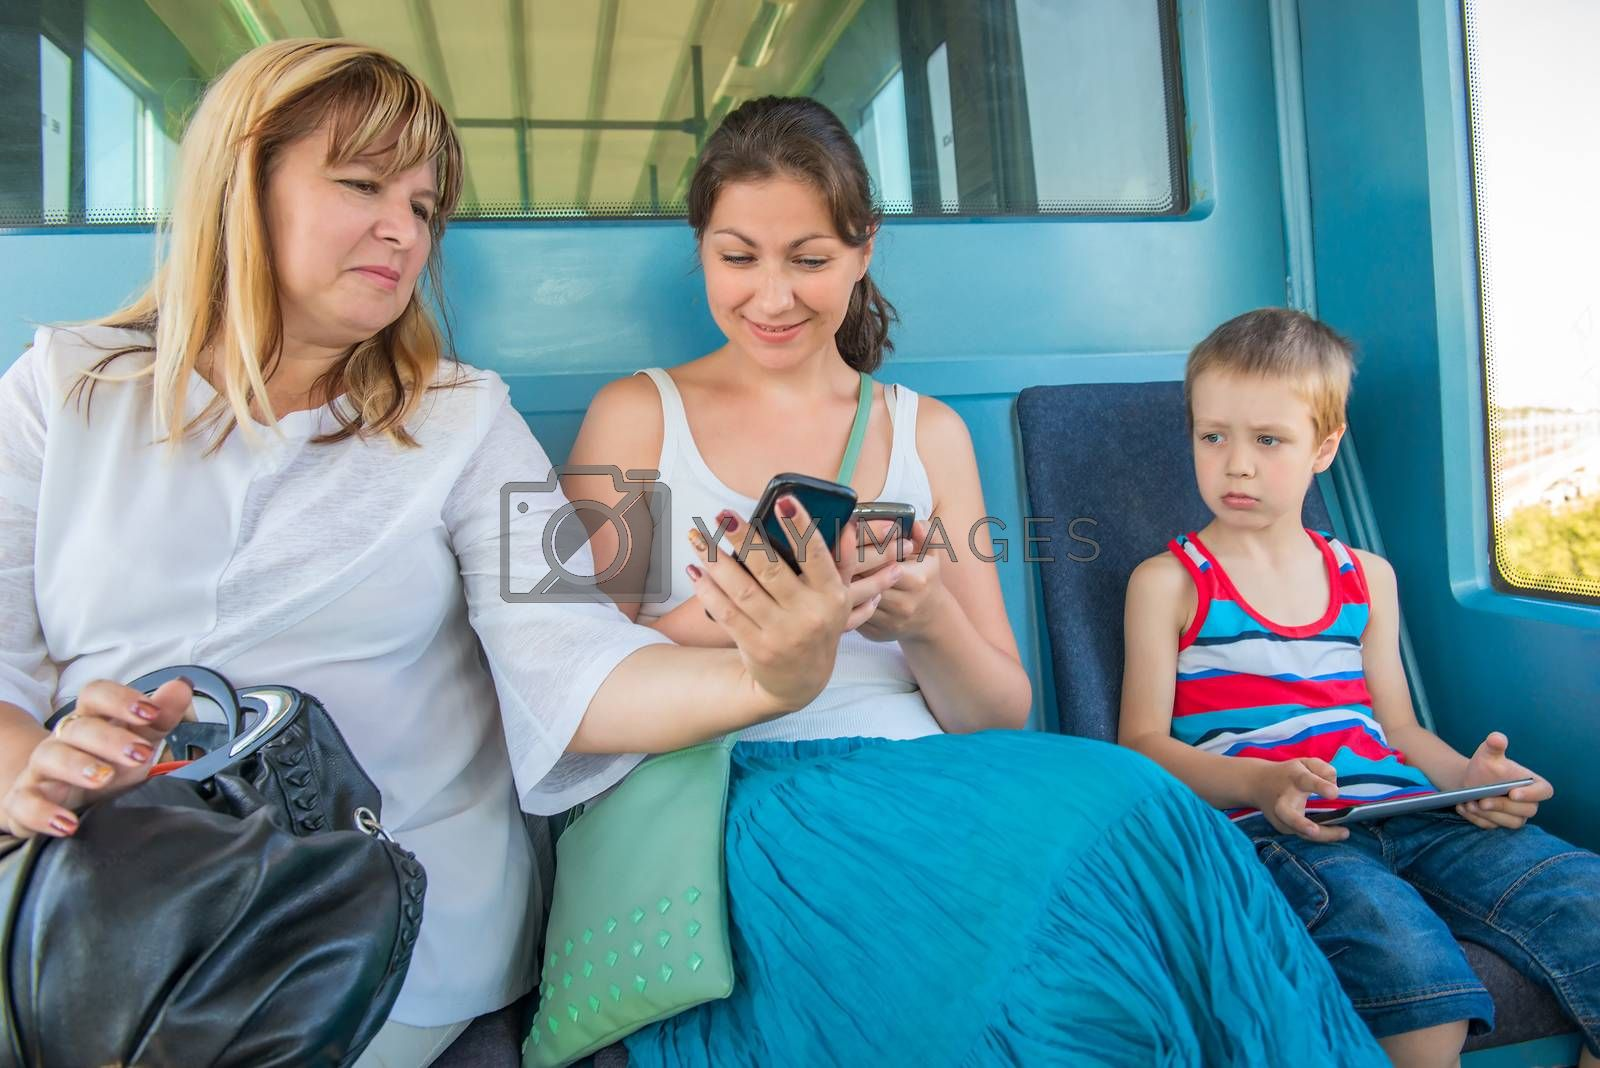 Portrait subway passengers with mobile devices